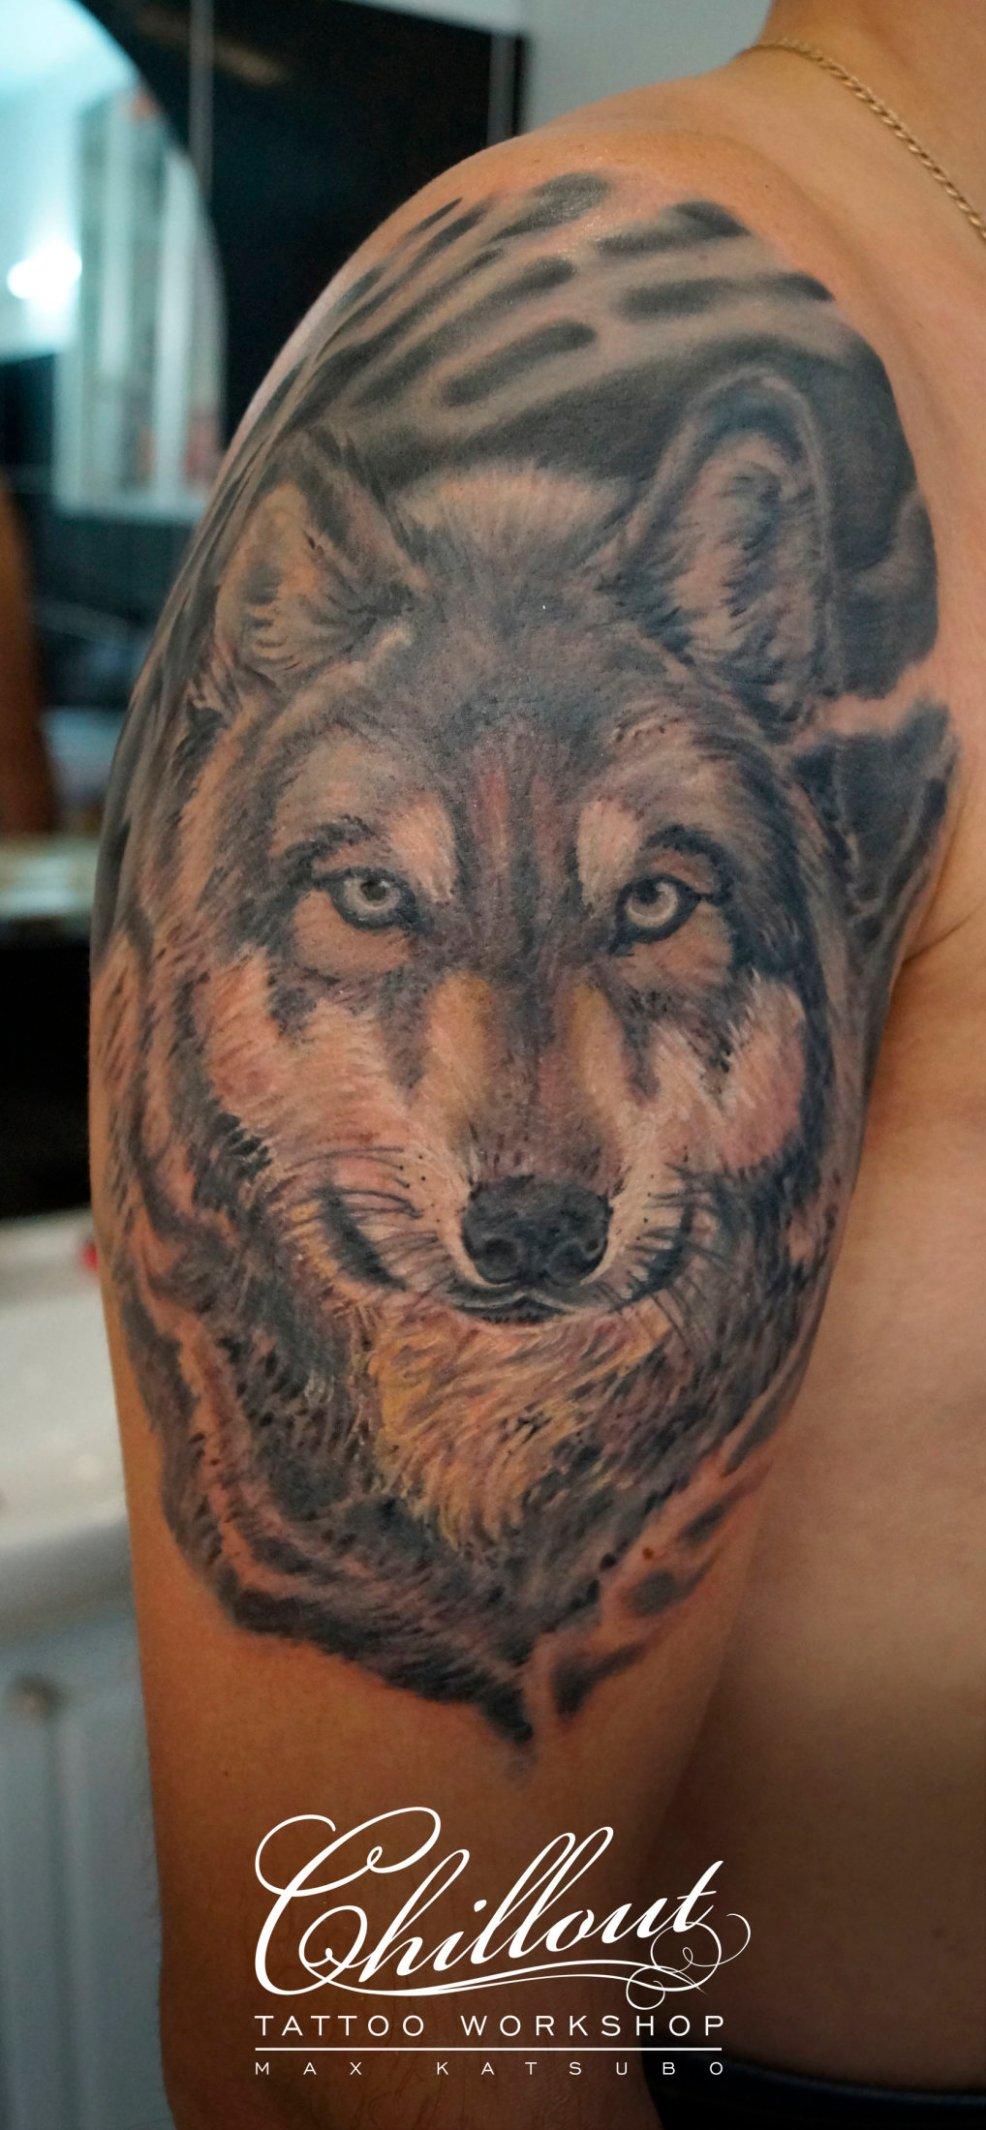 татуировка волк значение фото Chillout Tattoo Workshop